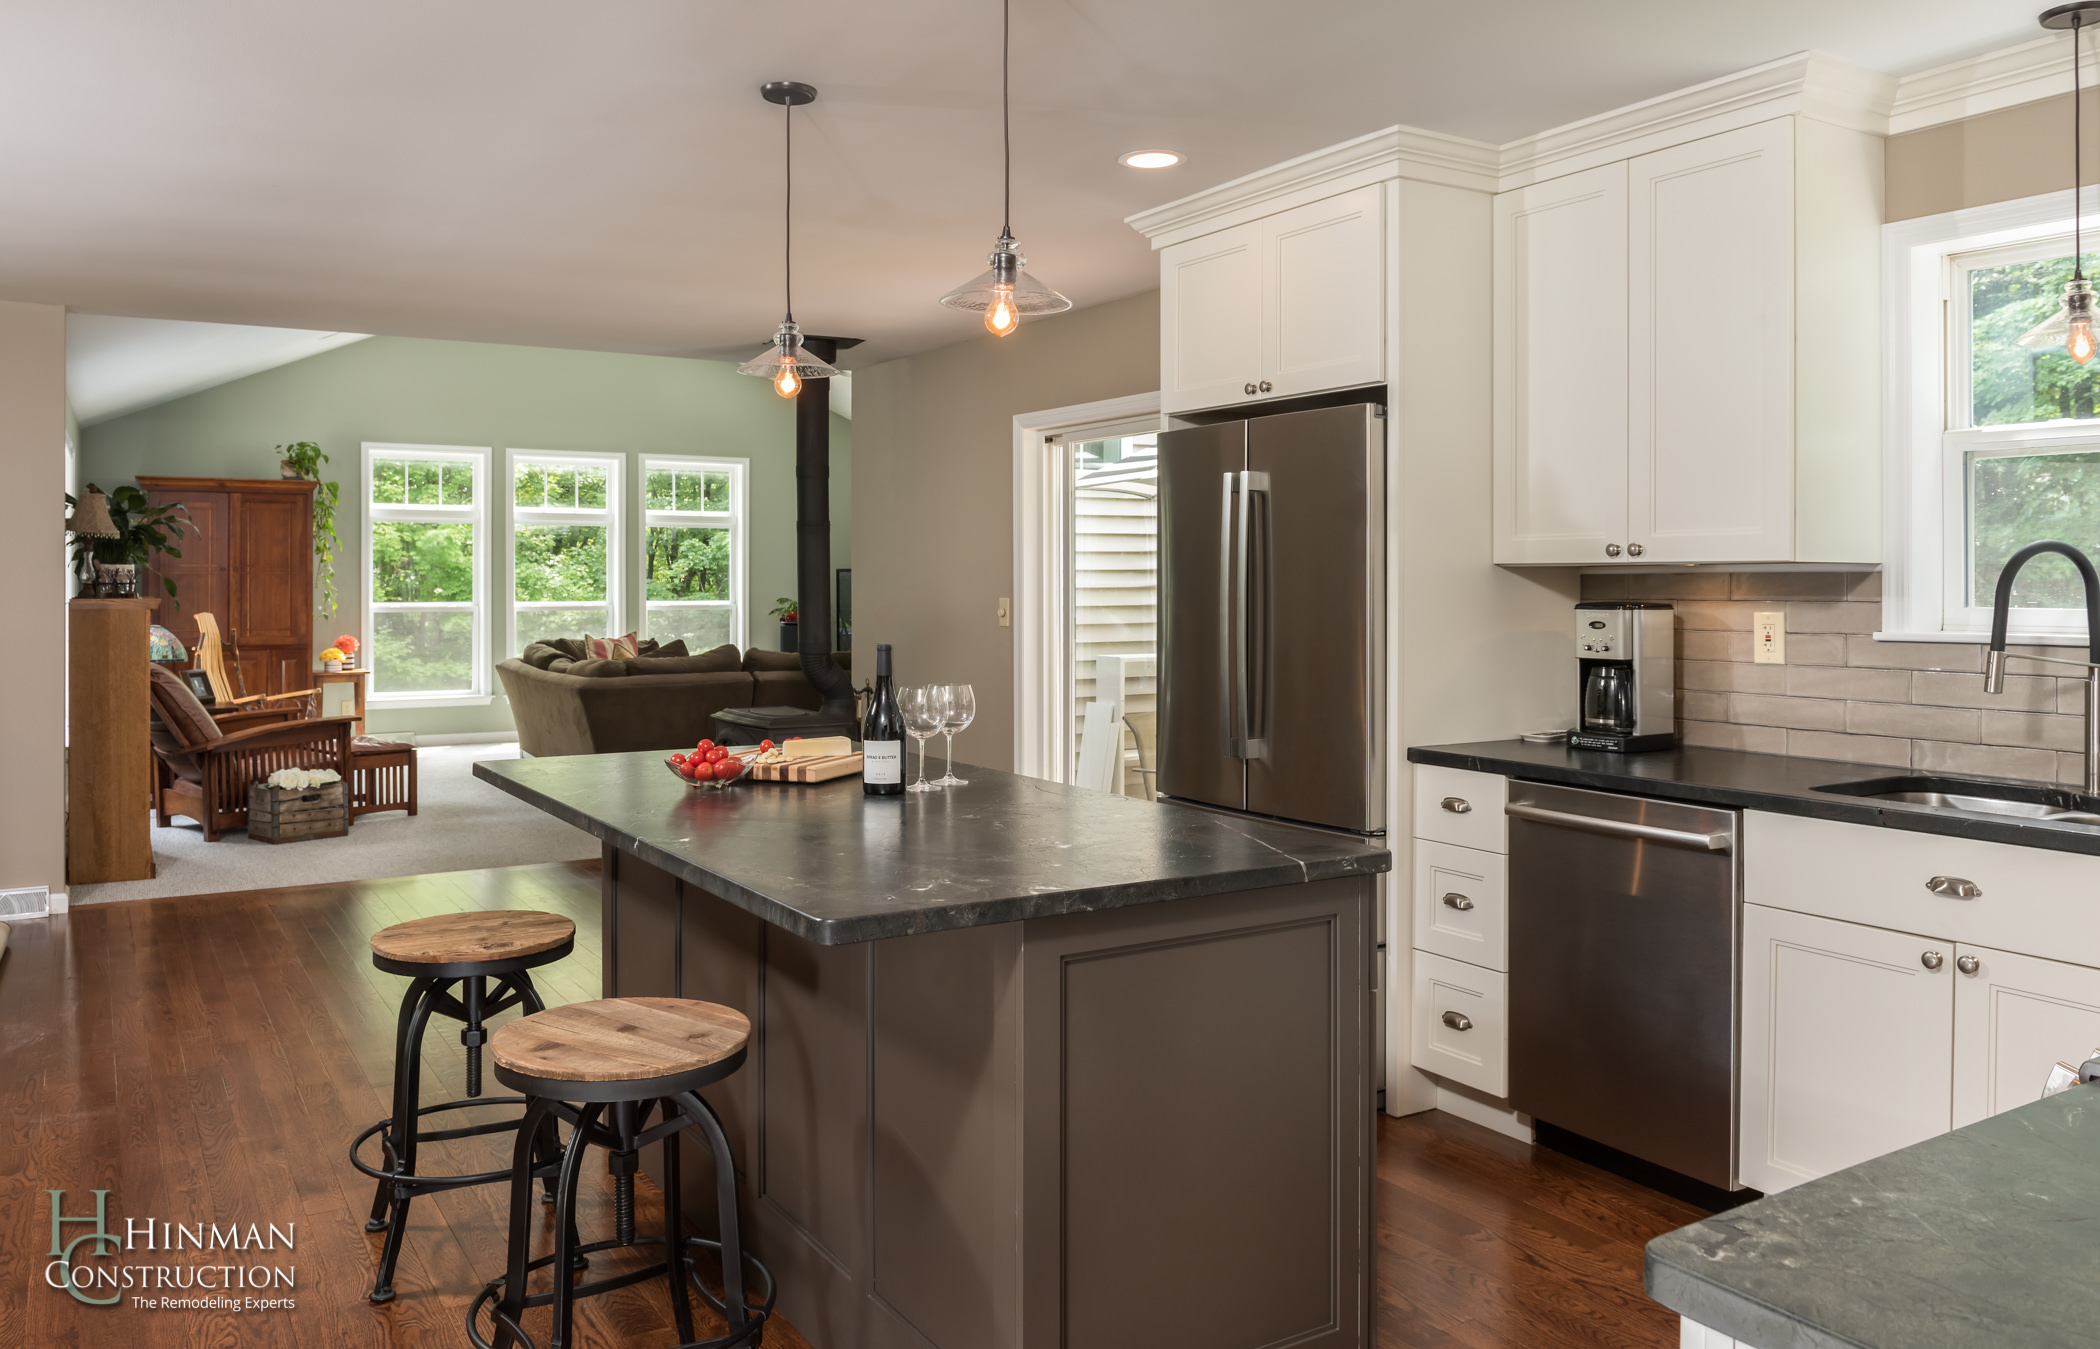 Modern Farmhouse Kitchen - Hinman Construction